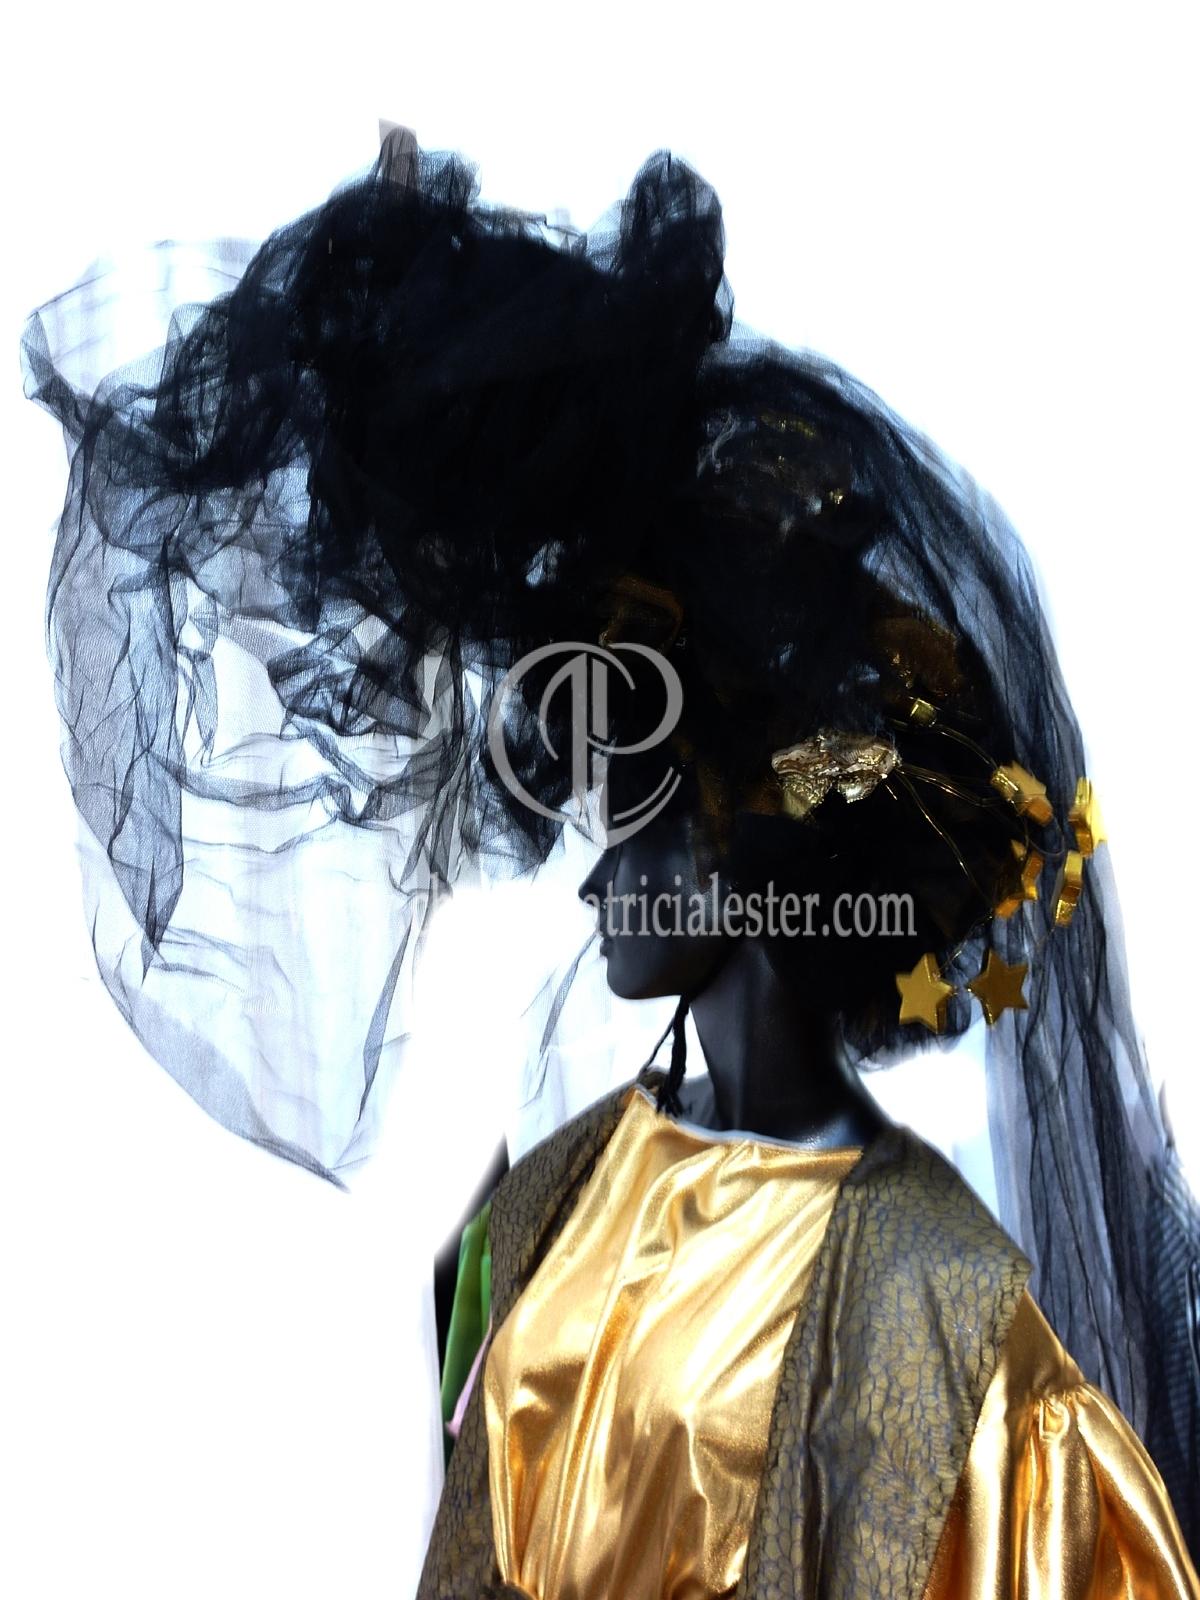 tpaper-bride-o-dracula-hat